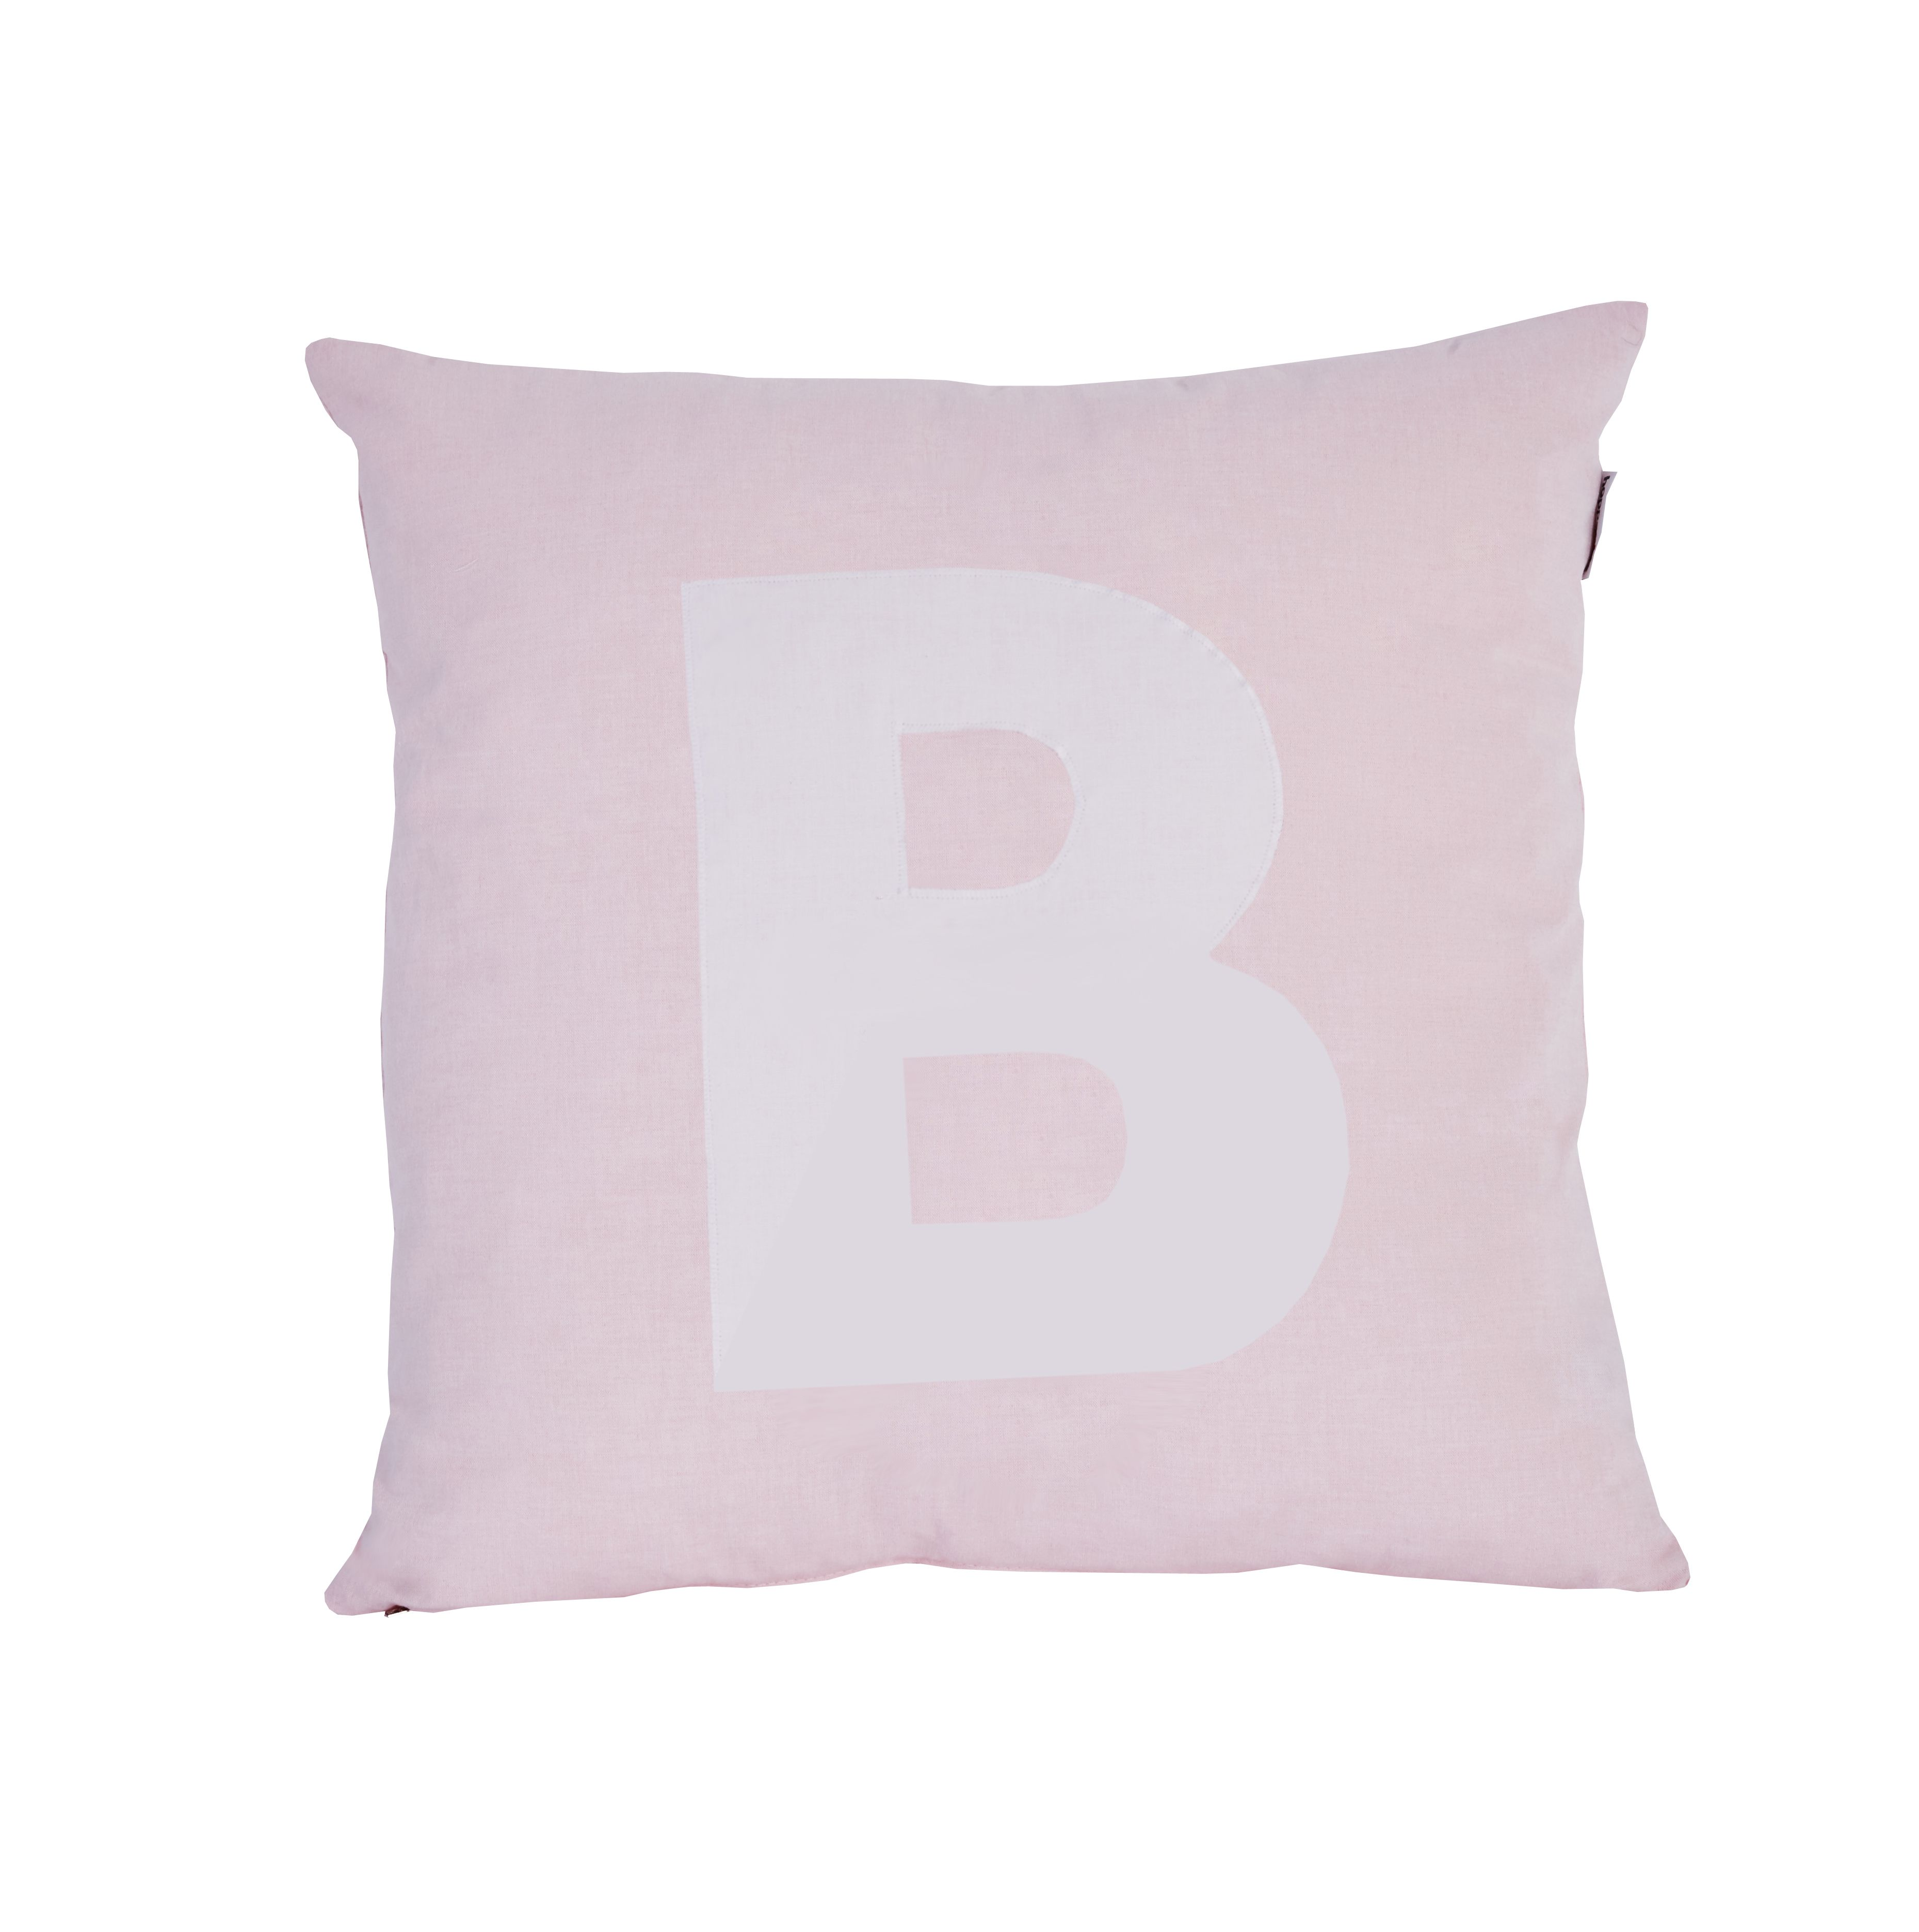 Pude Alphabet B lyserød fra Hoppekids